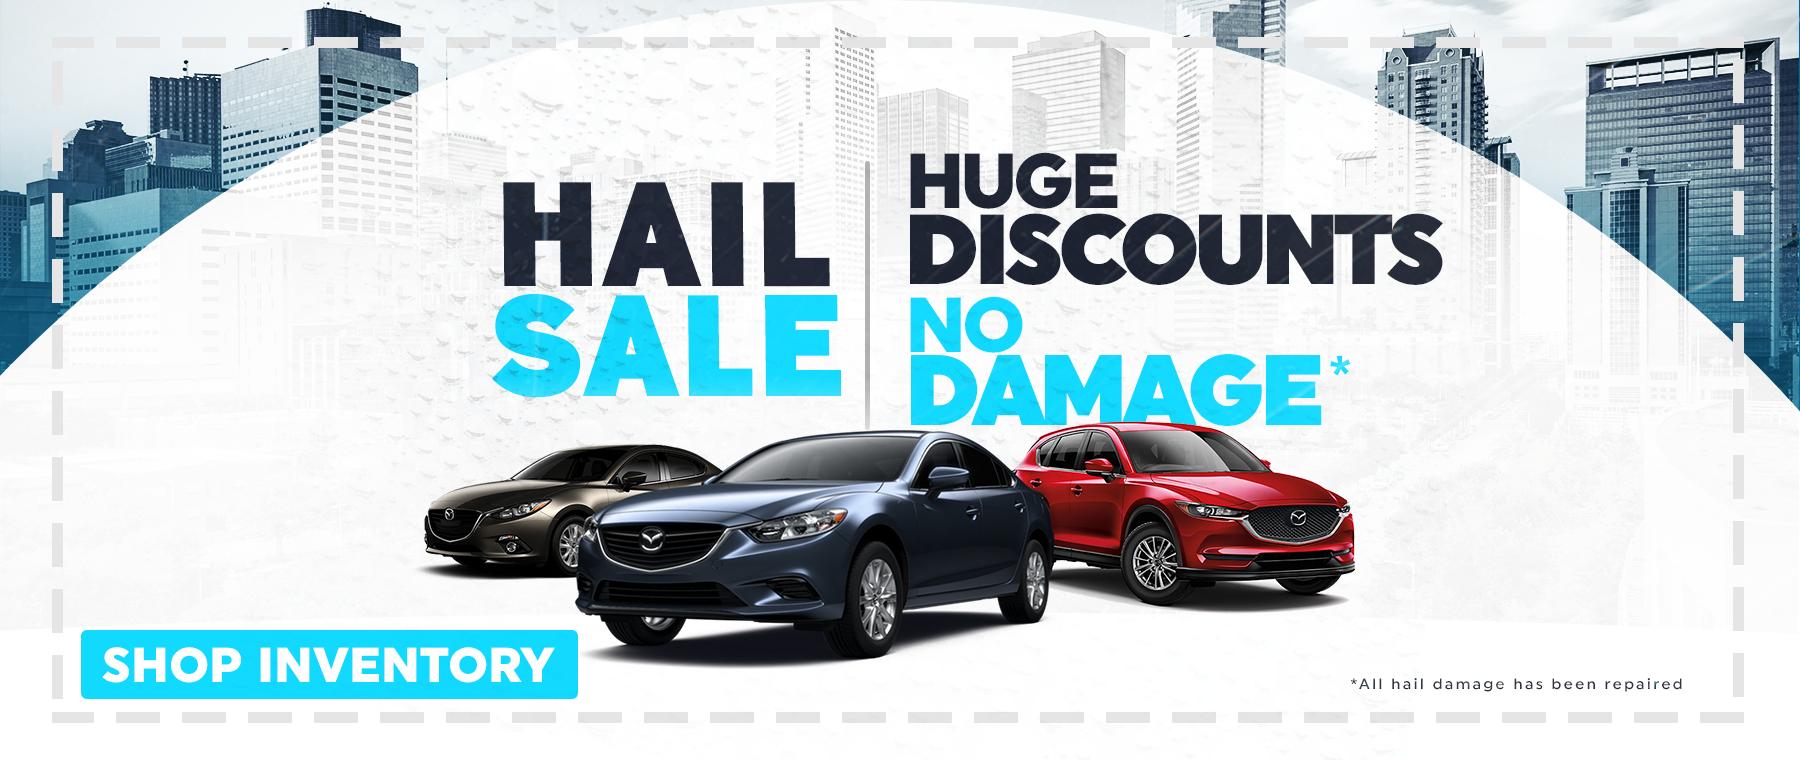 Hail Sale at Jeff Haas Mazda